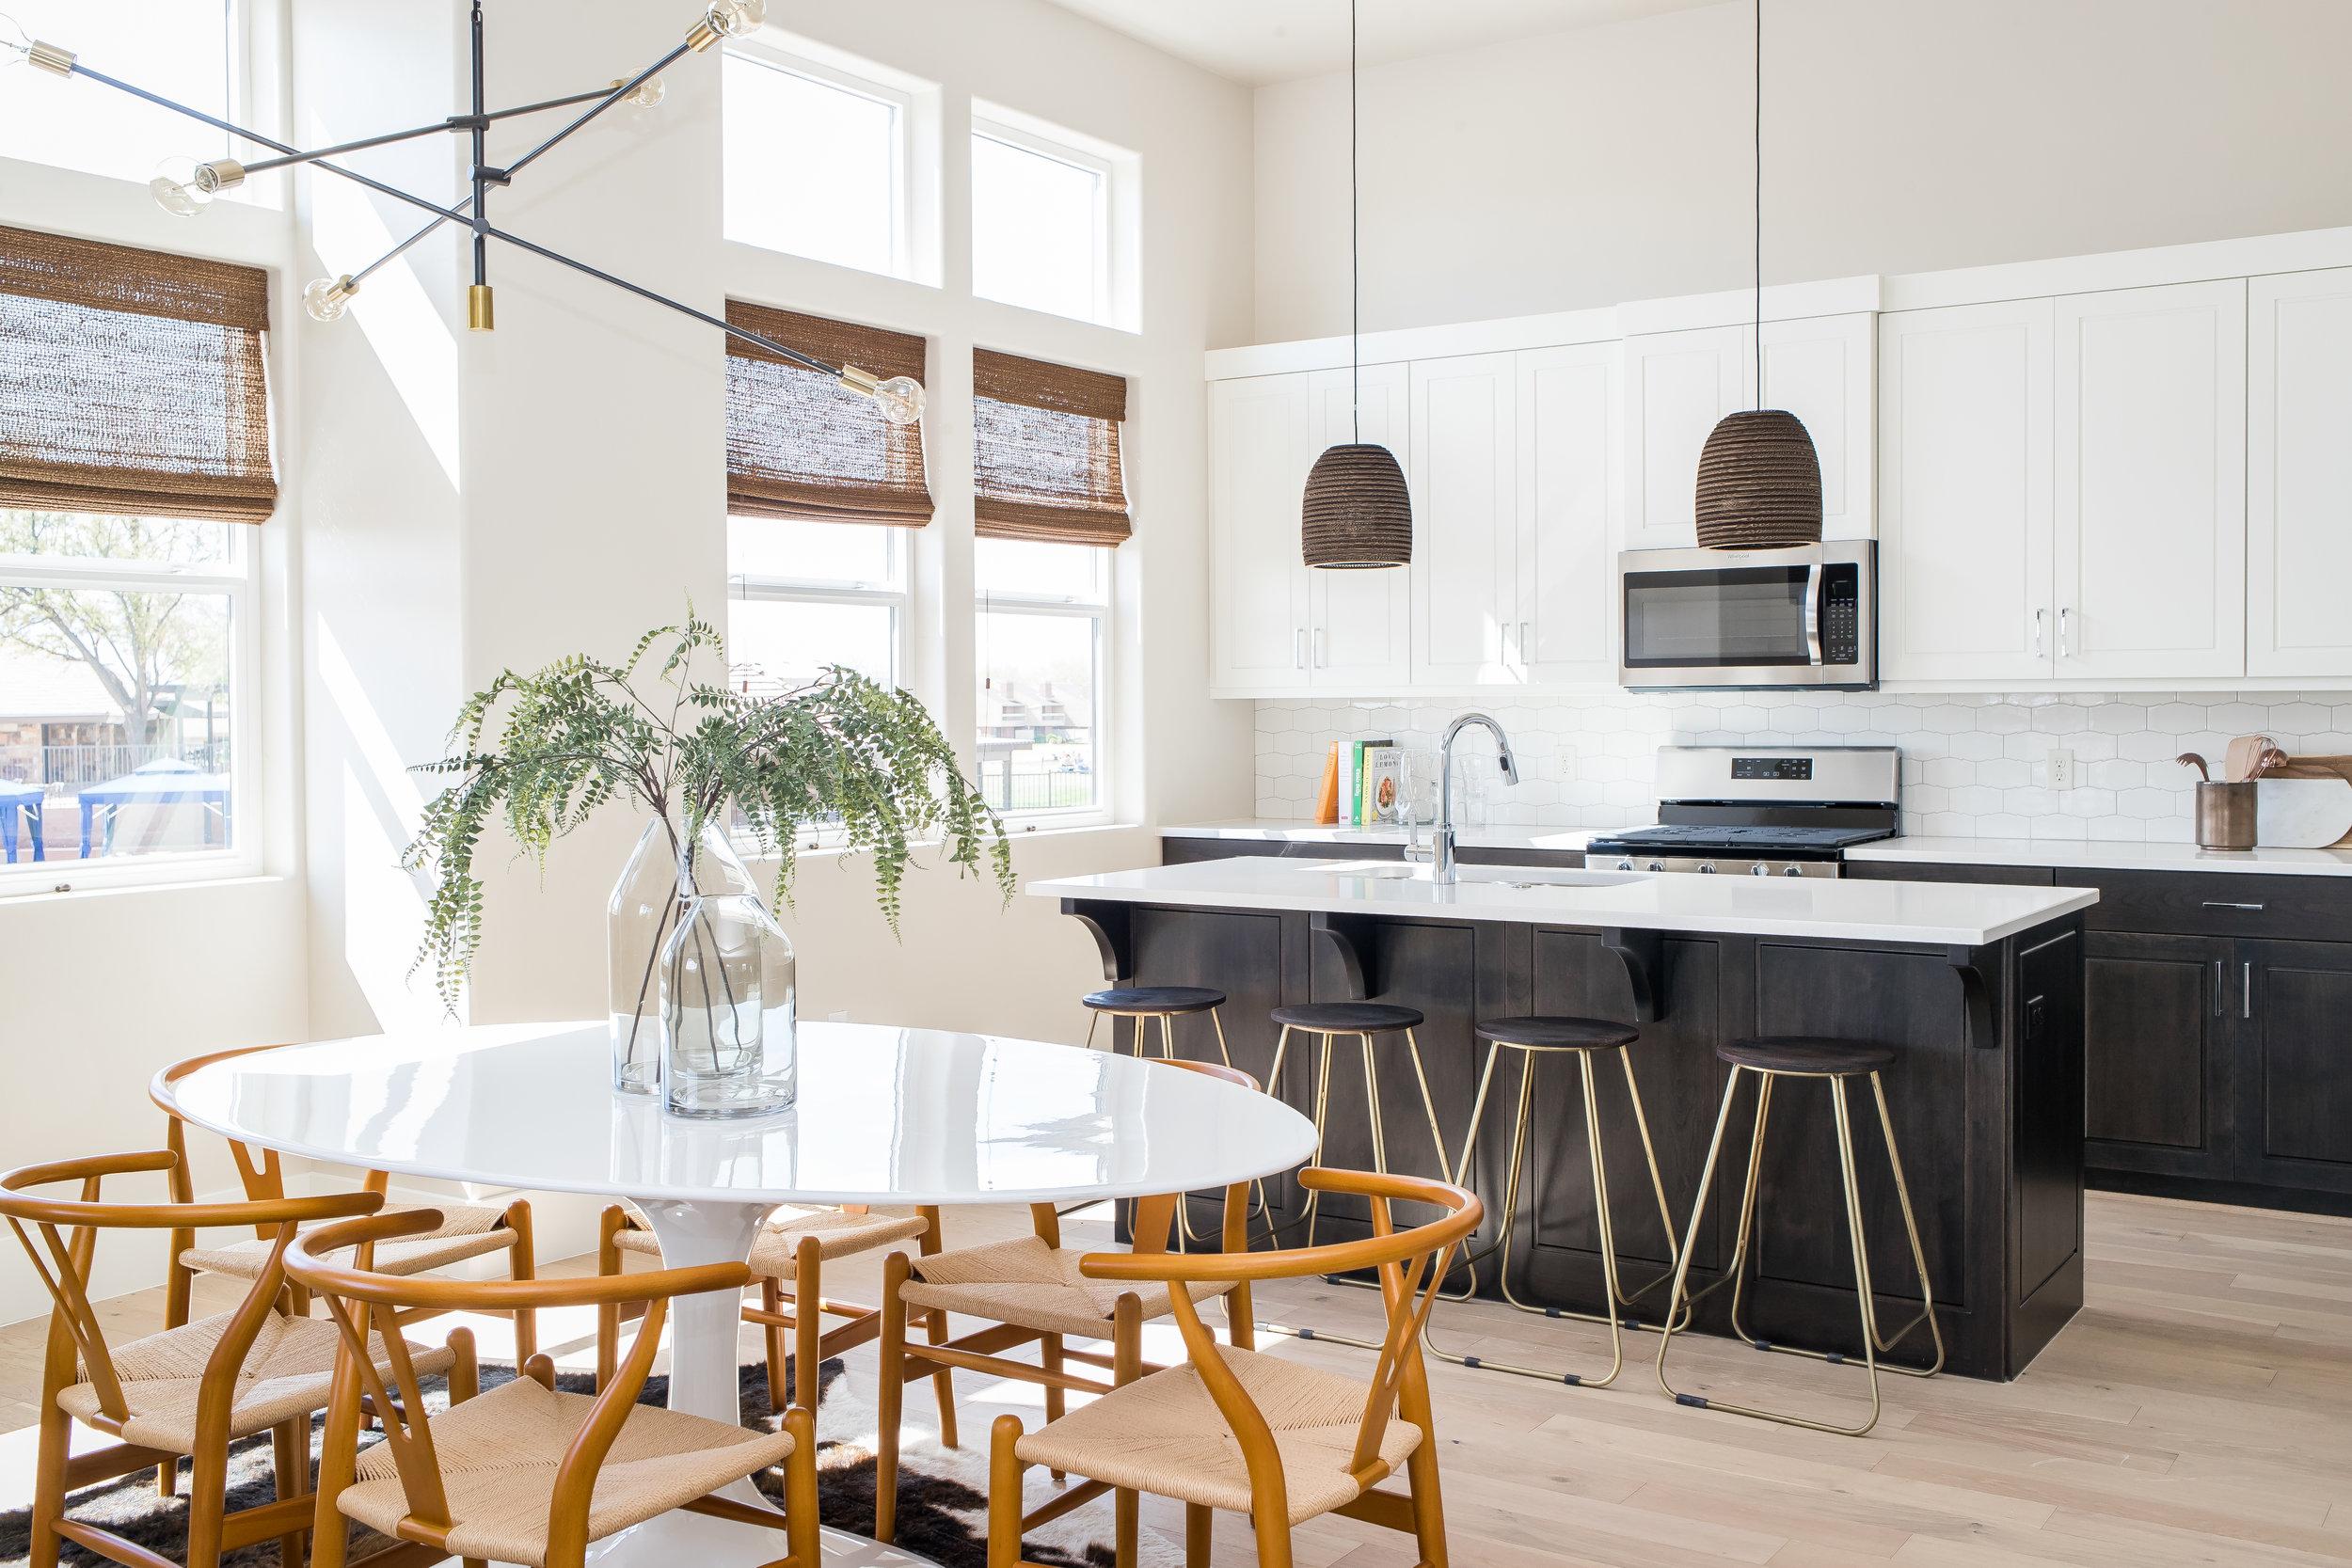 Upper Level - Dining/Kitchen